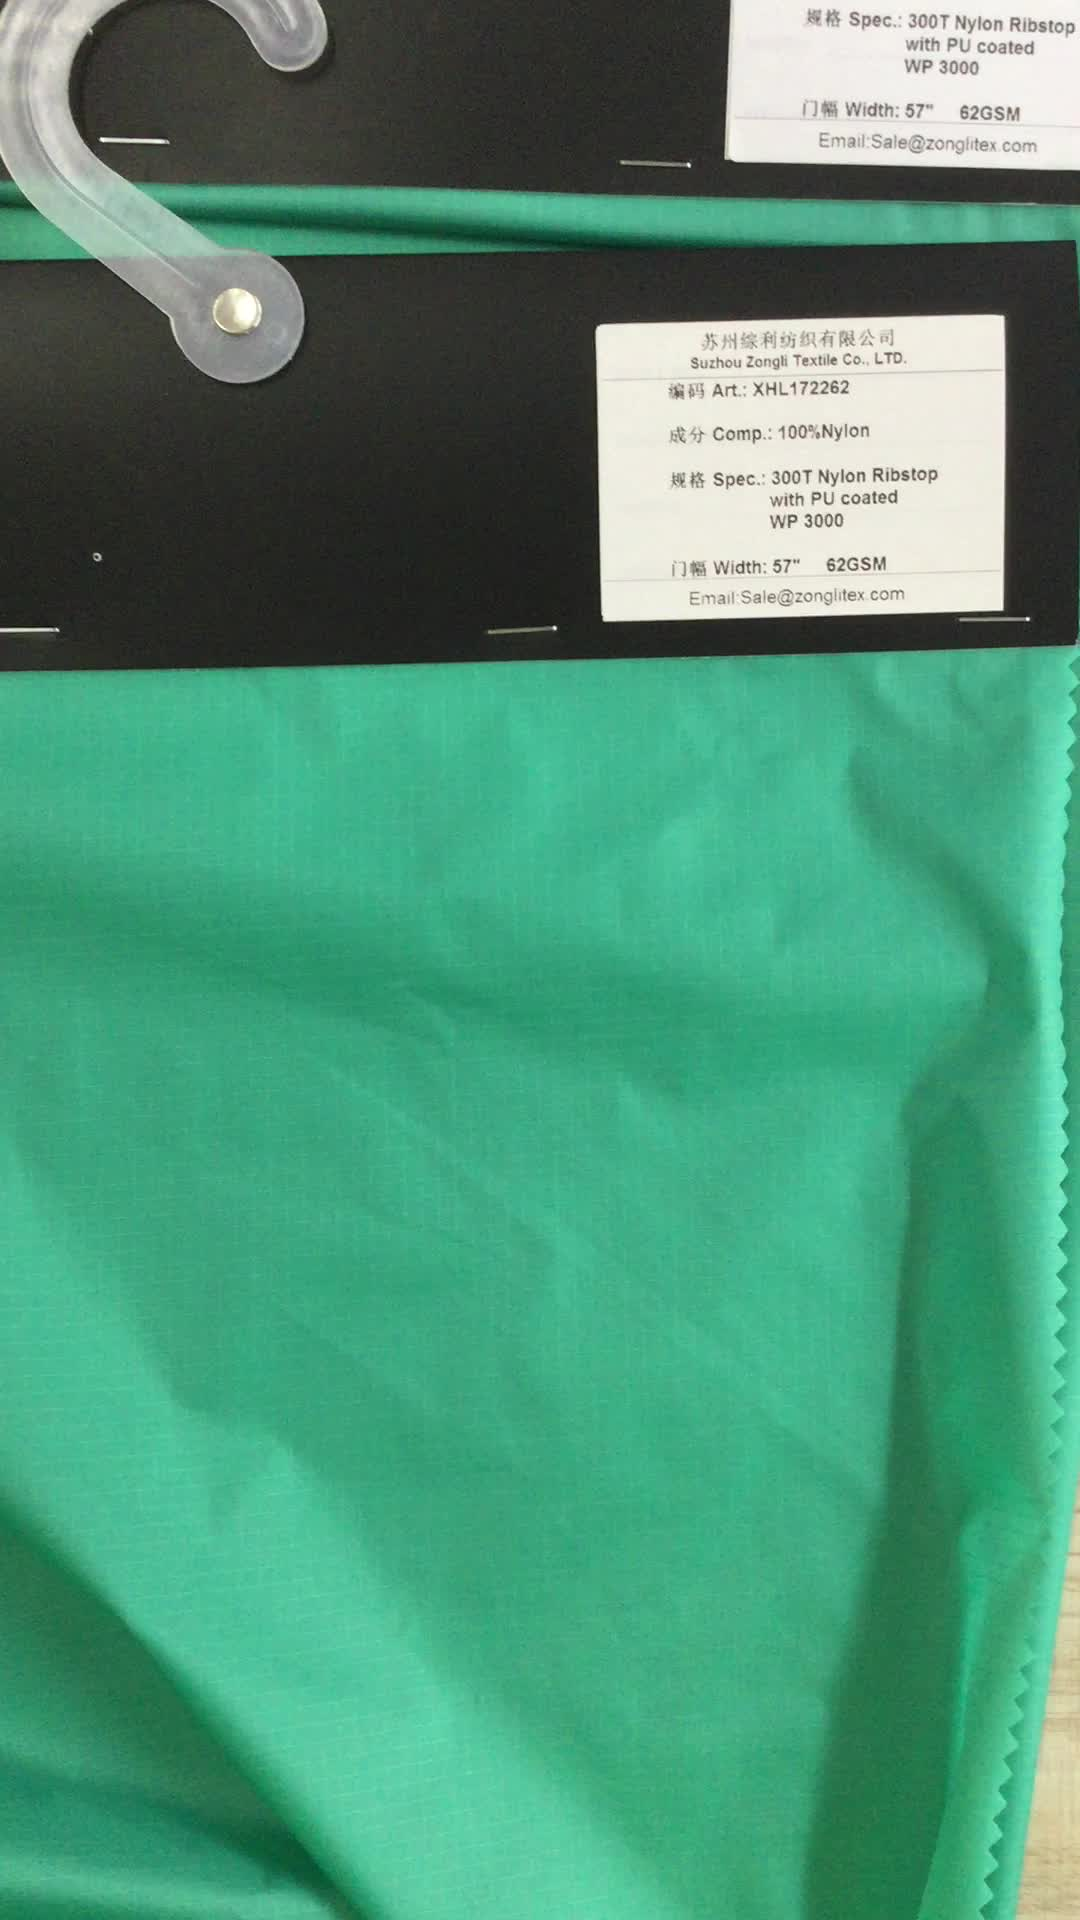 Make to order 100%polyester 320T 63gsm 50D*50D digital print taffeta fabric for down coat